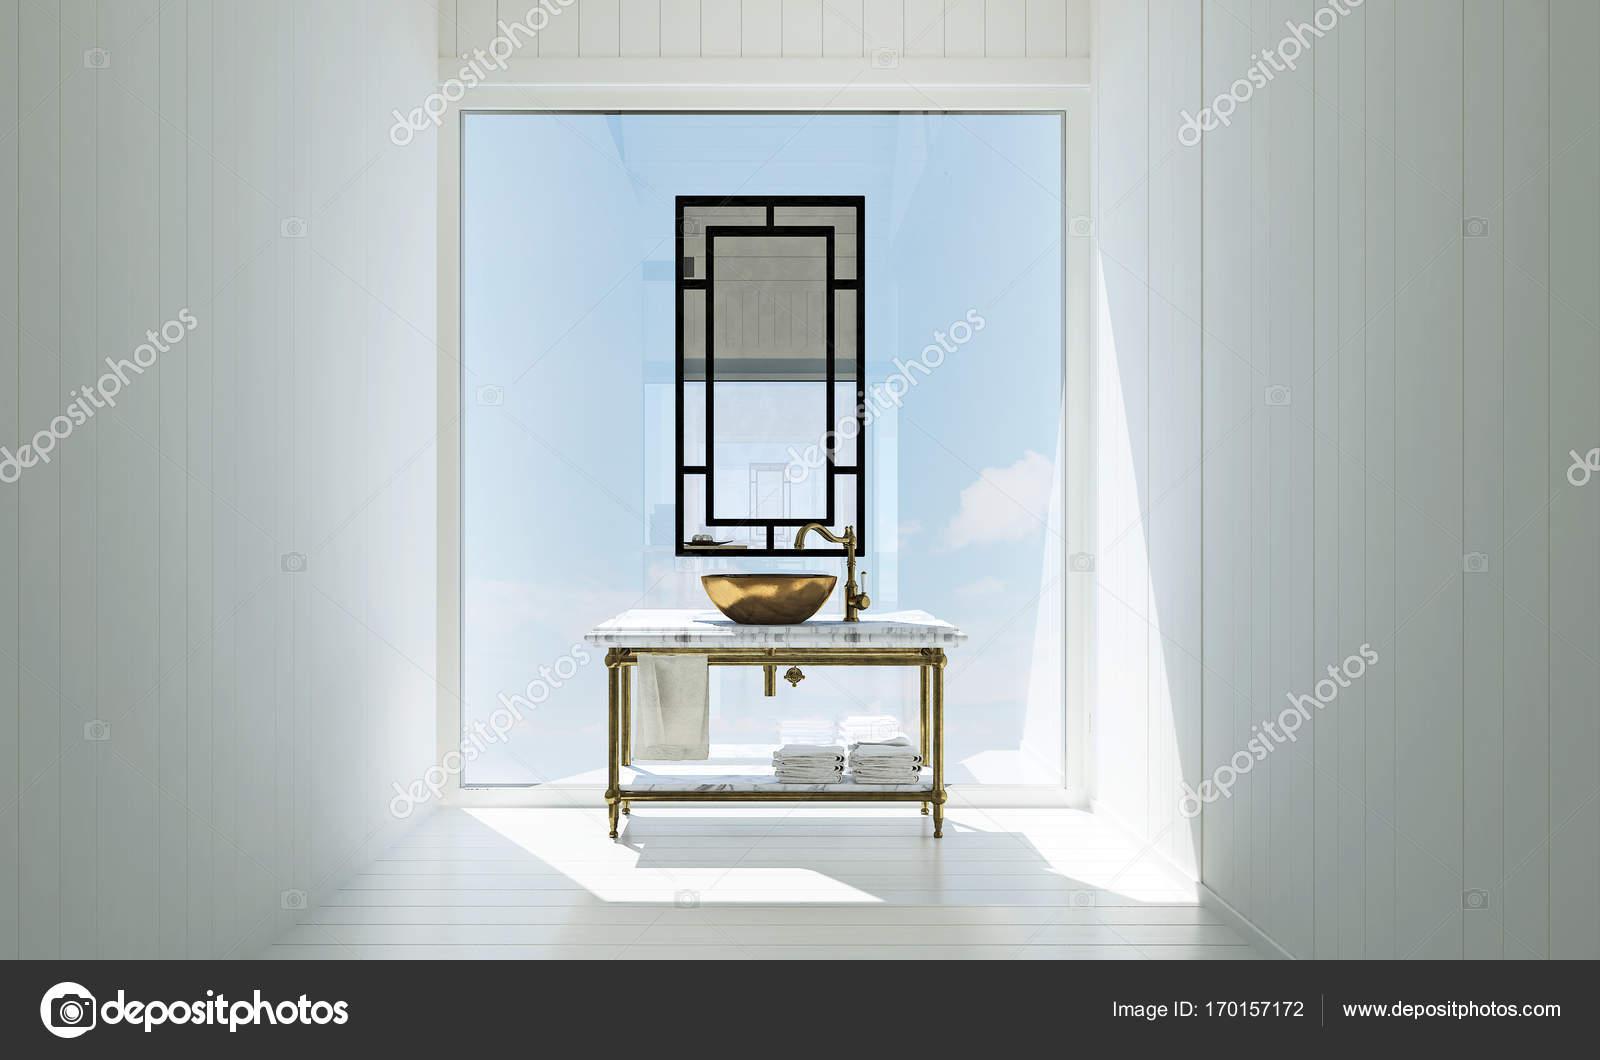 Badkamer Beton Interieur : De witte badkamer interieur en beton muur textuur achtergrond en